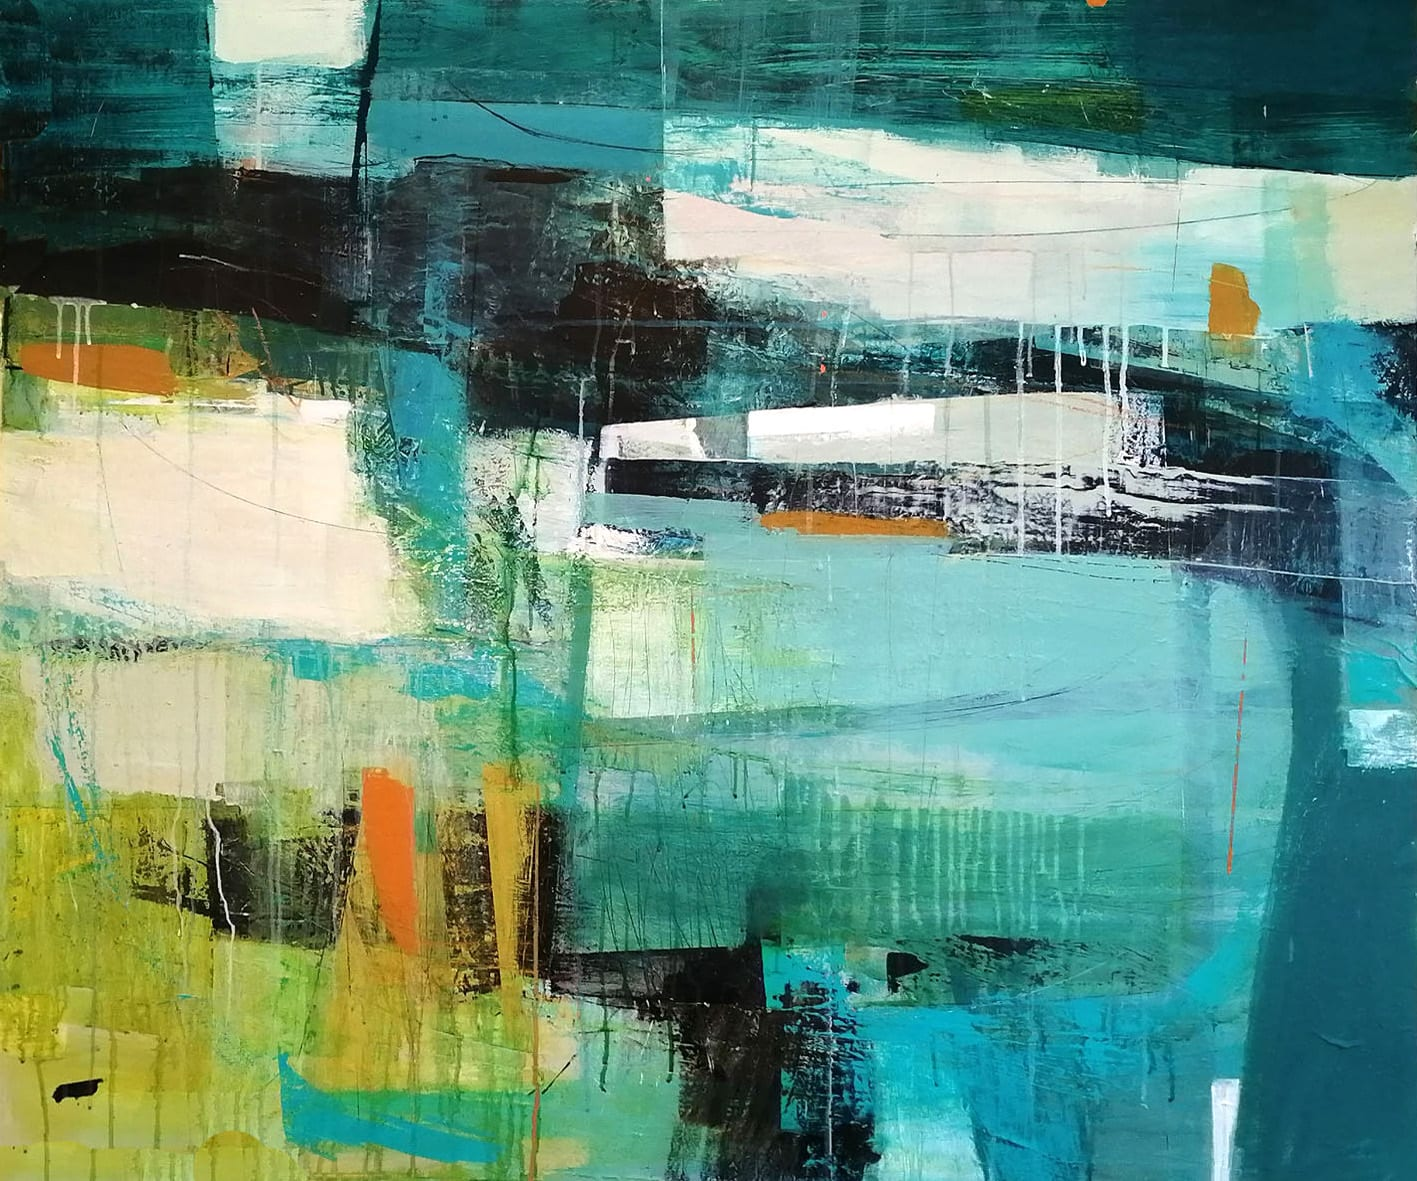 "<span class=""link fancybox-details-link""><a href=""/artists/66-joanne-last/works/7757-joanne-last-night-harbour-2021/"">View Detail Page</a></span><div class=""artist""><strong>Joanne Last</strong></div> <div class=""title""><em>Night Harbour</em>, 2021</div> <div class=""signed_and_dated"">signed and dated on verso</div> <div class=""medium"">acrylic on canvas</div> <div class=""dimensions"">canvas: 100 x 120 cm<br /> framed: 106 x 126 cm</div><div class=""copyright_line"">Own Art: £250 x 10 Months, 0% APR + £10 deposit</div>"